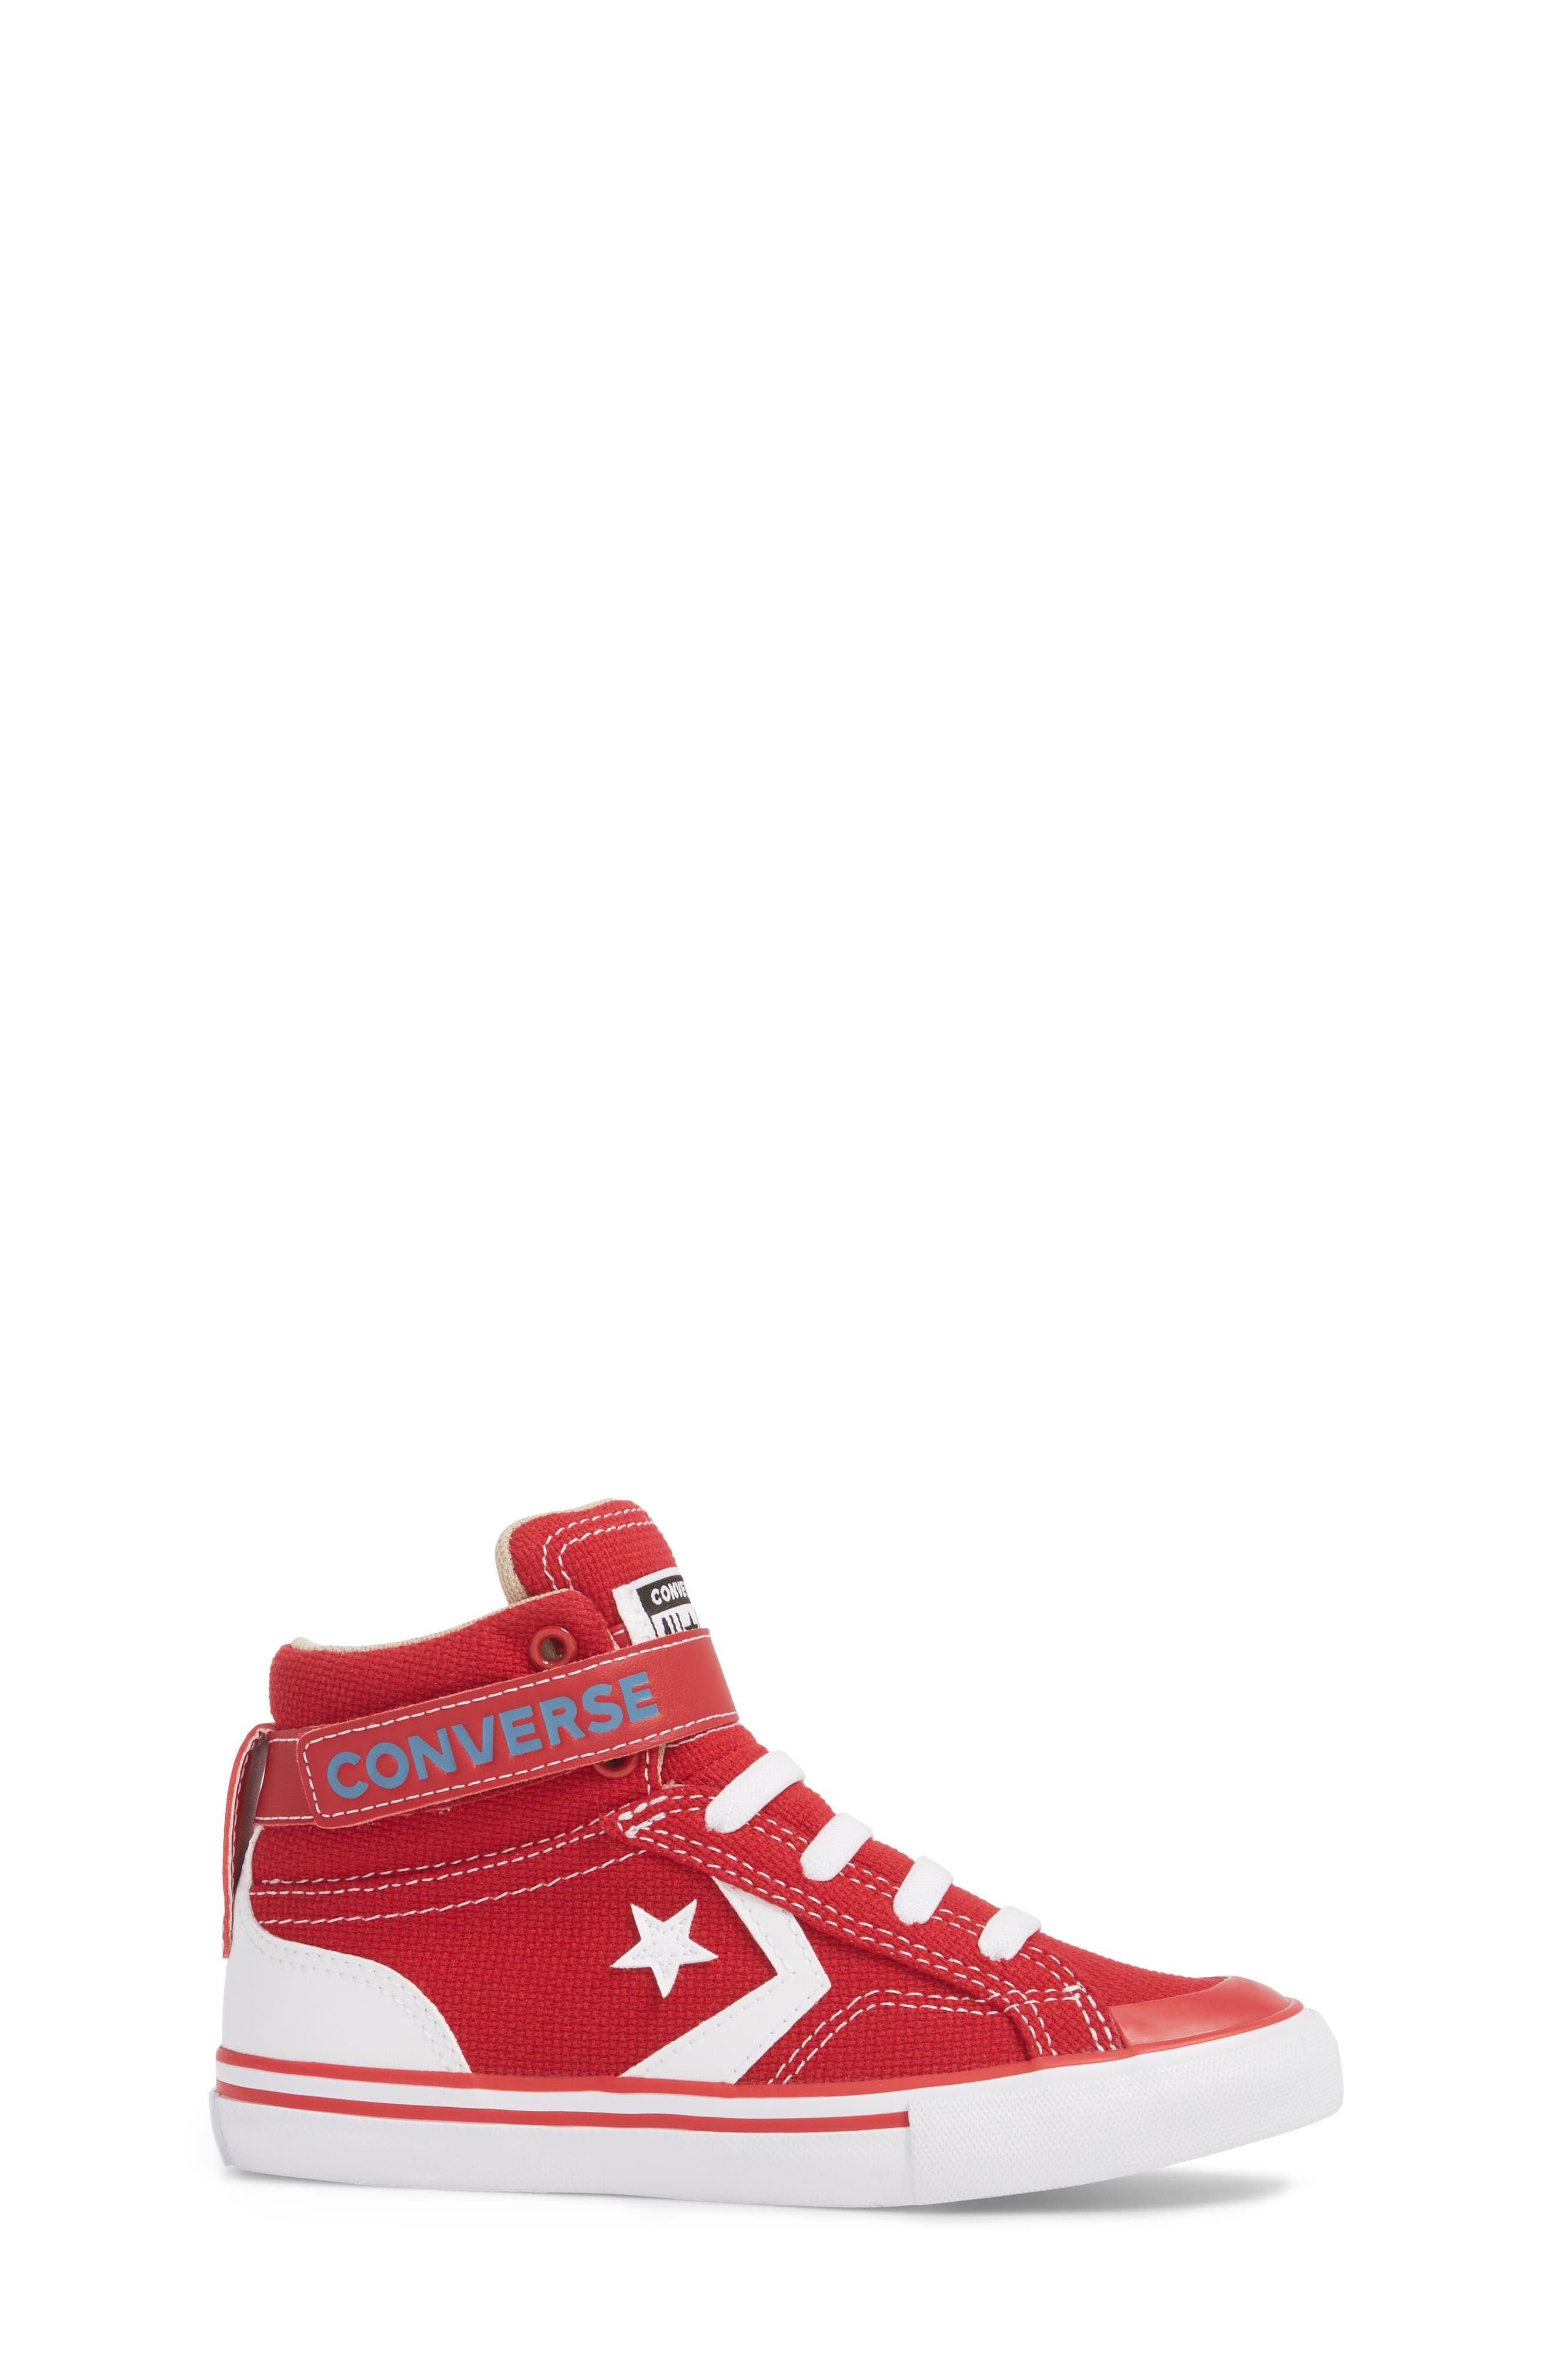 Pro Blaze High Top Sneaker,                             Alternate thumbnail 6, color,